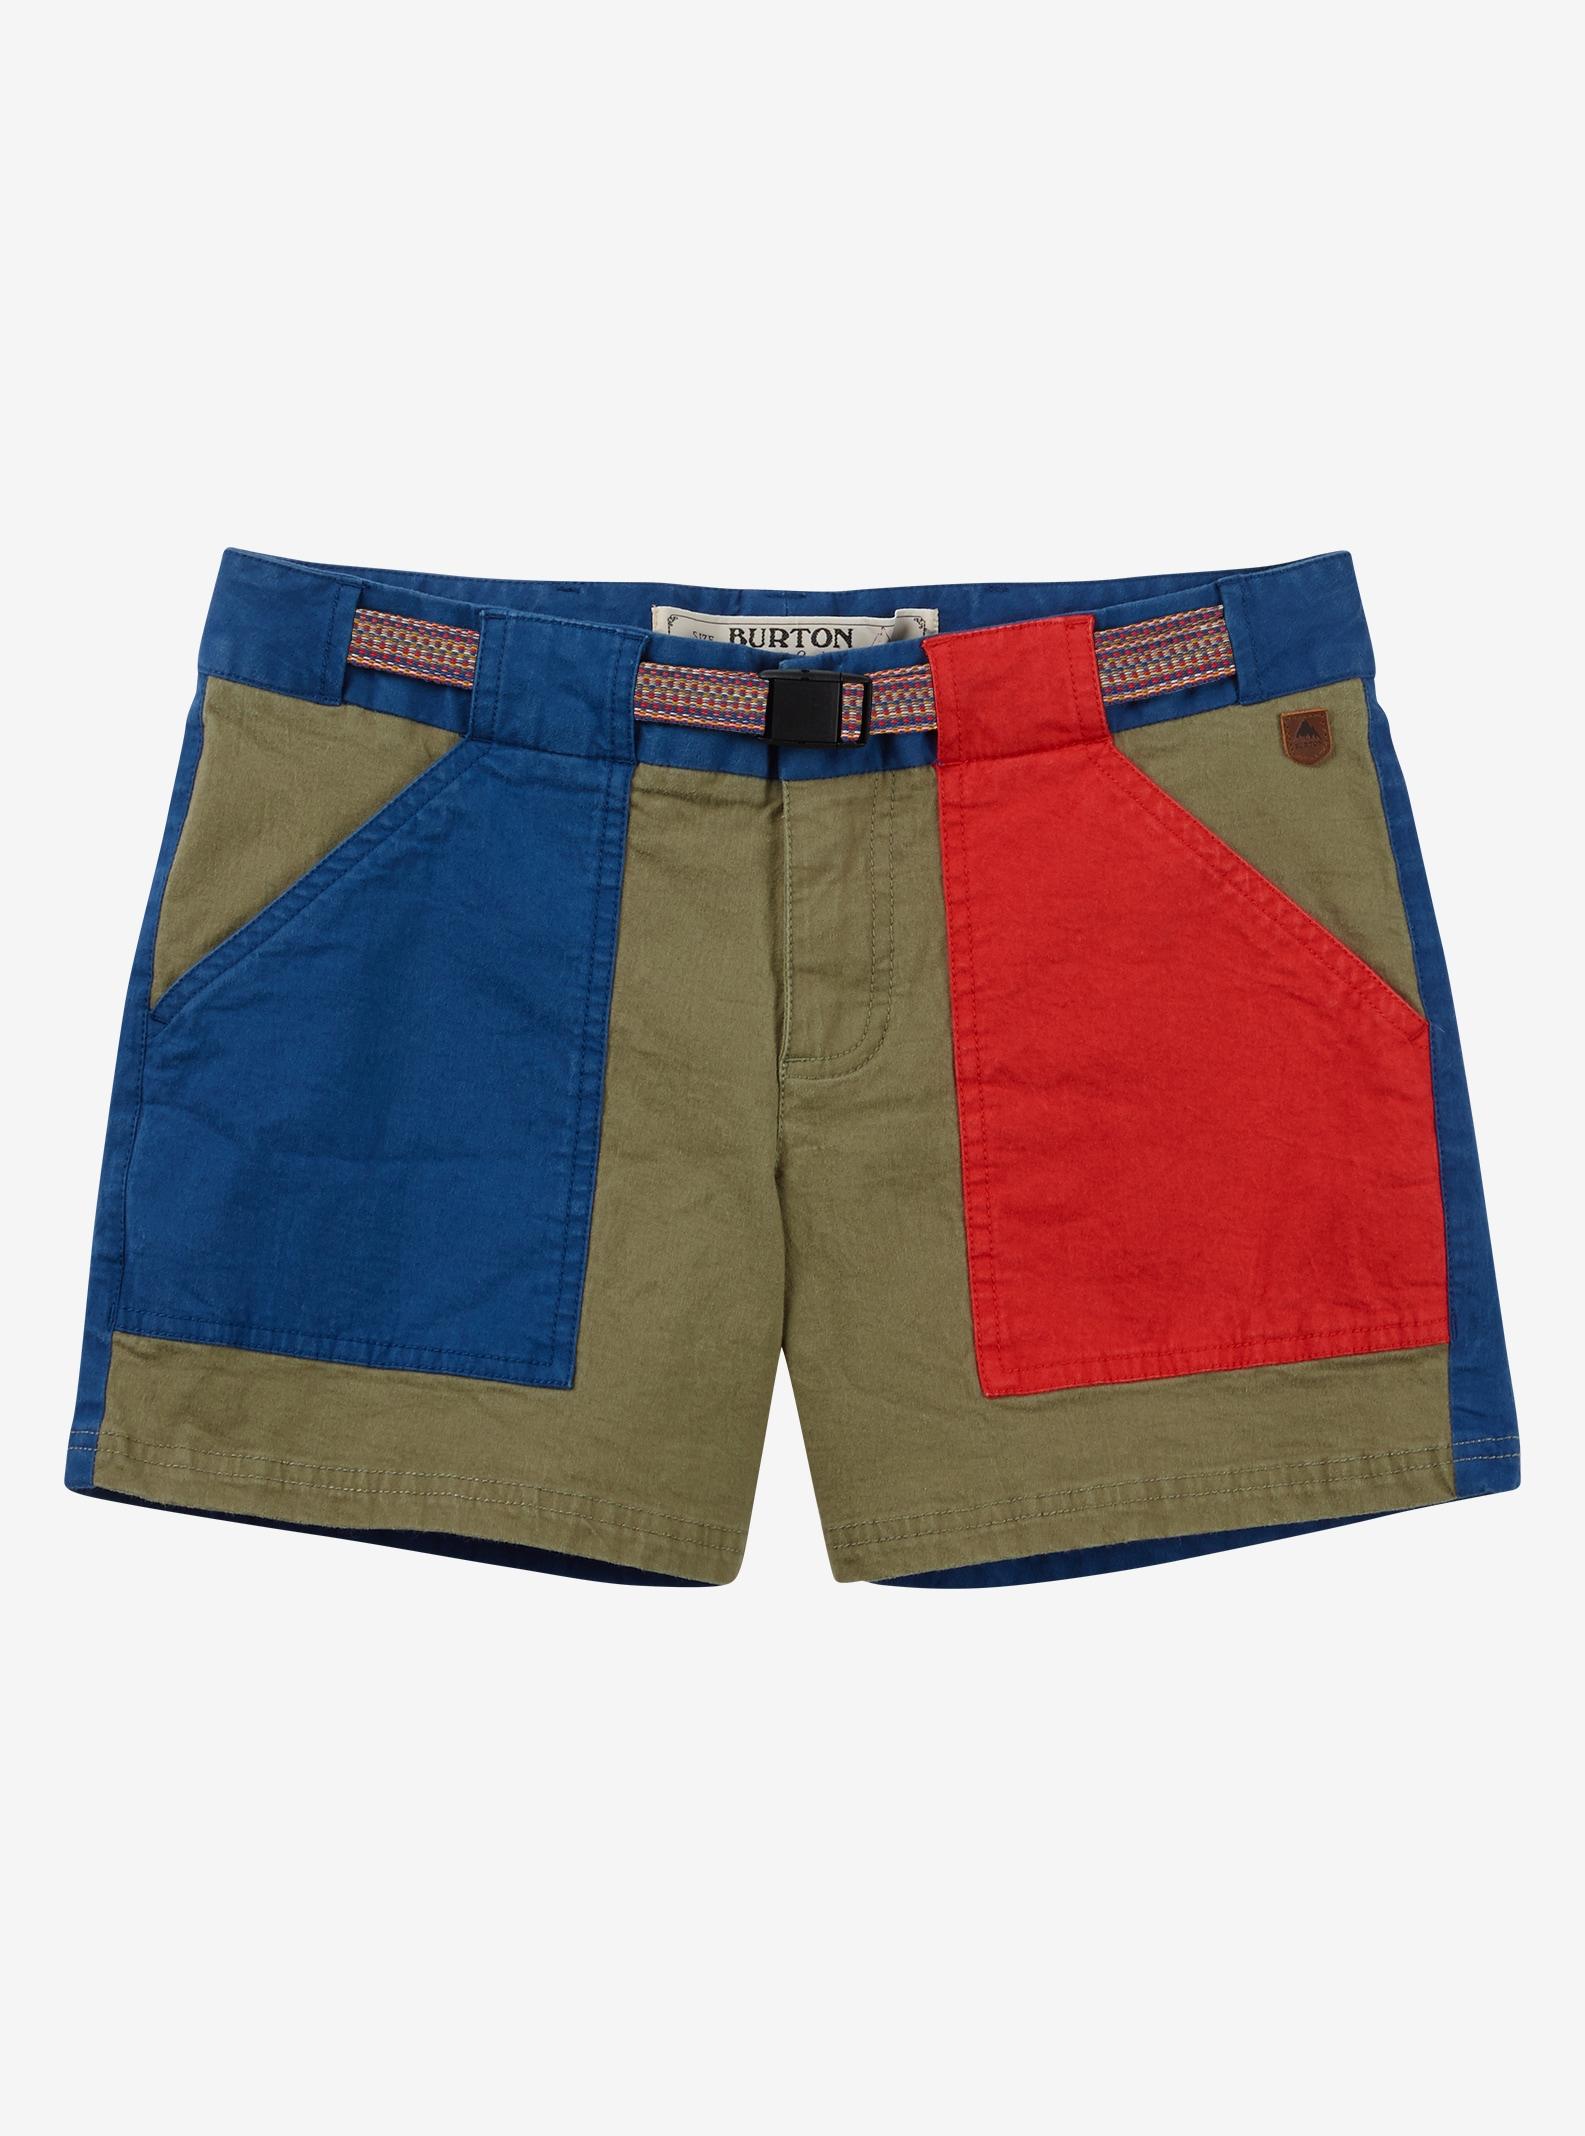 Burton Loco Shorts shown in Lichen Green / True Blue / Coral